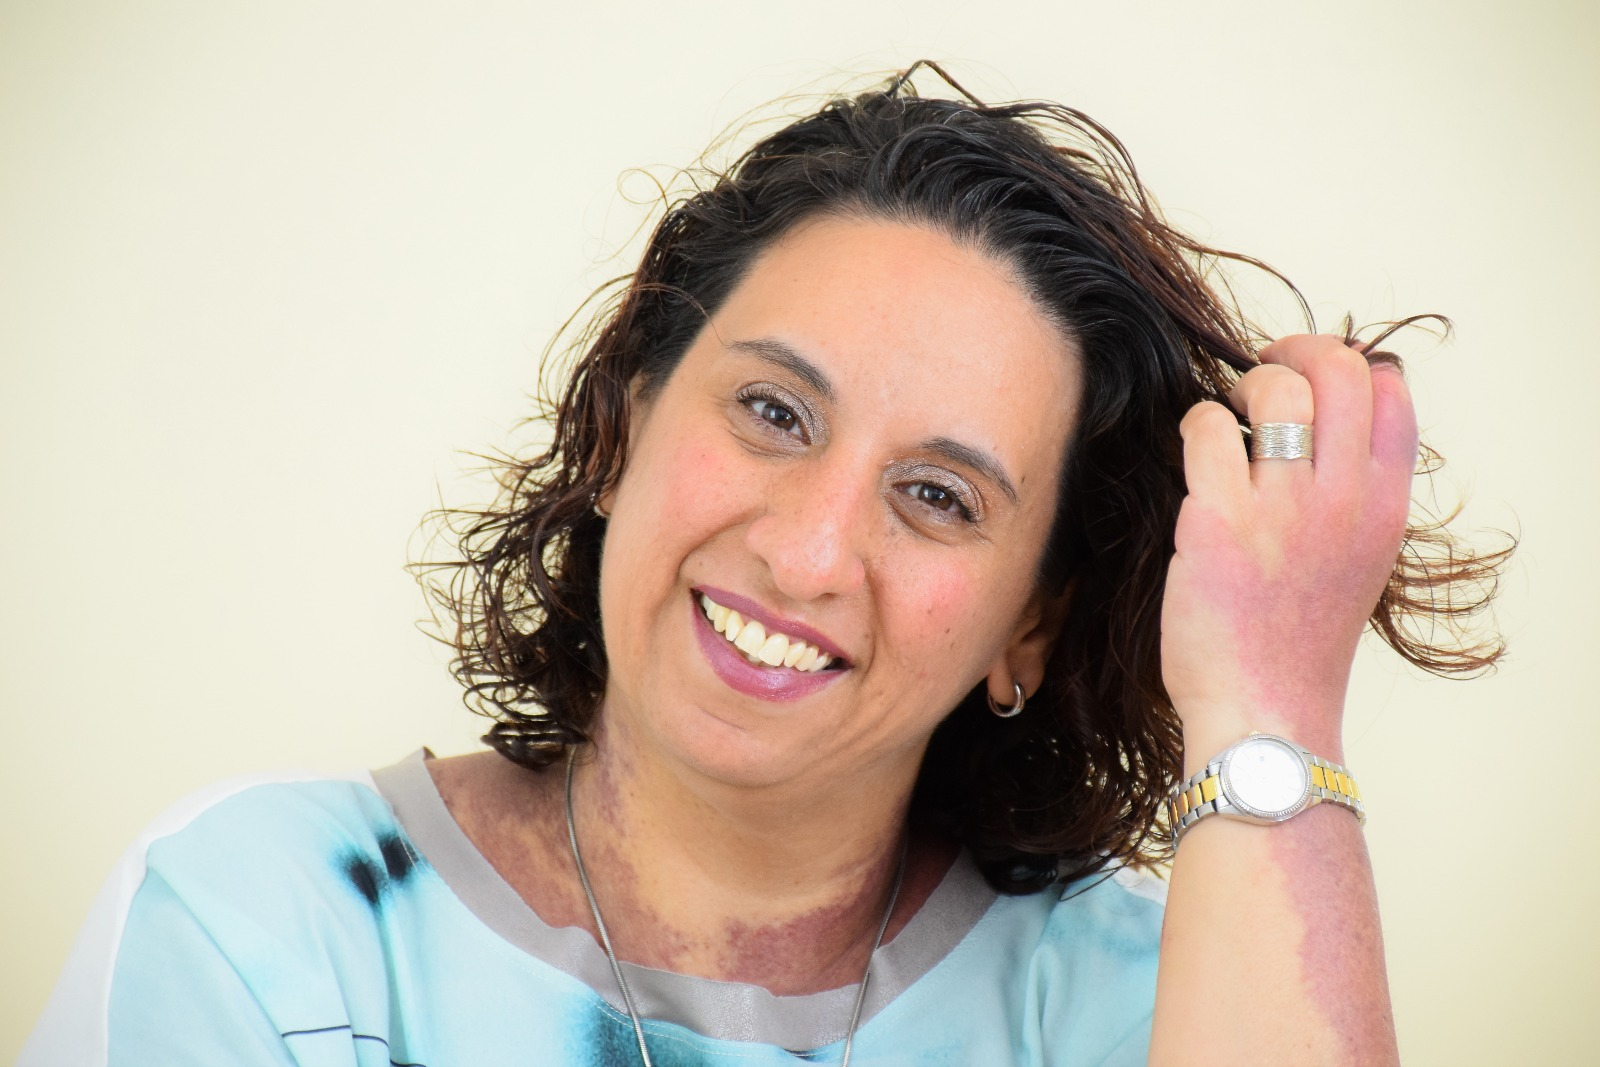 לילך מנטש (צילום: אלונה ירדן)